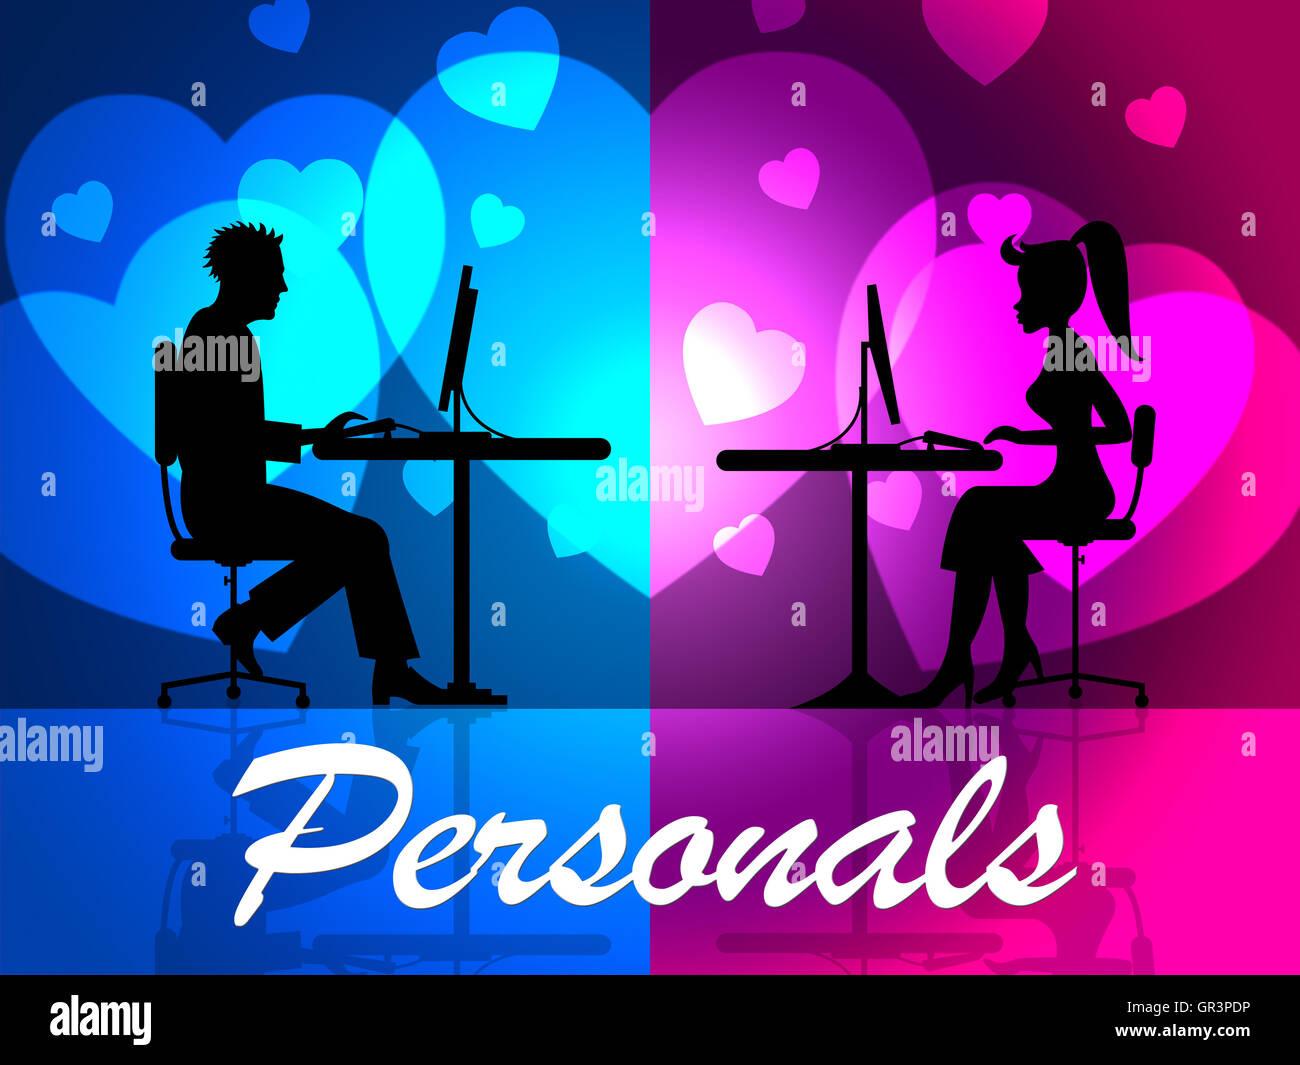 Redbook personals